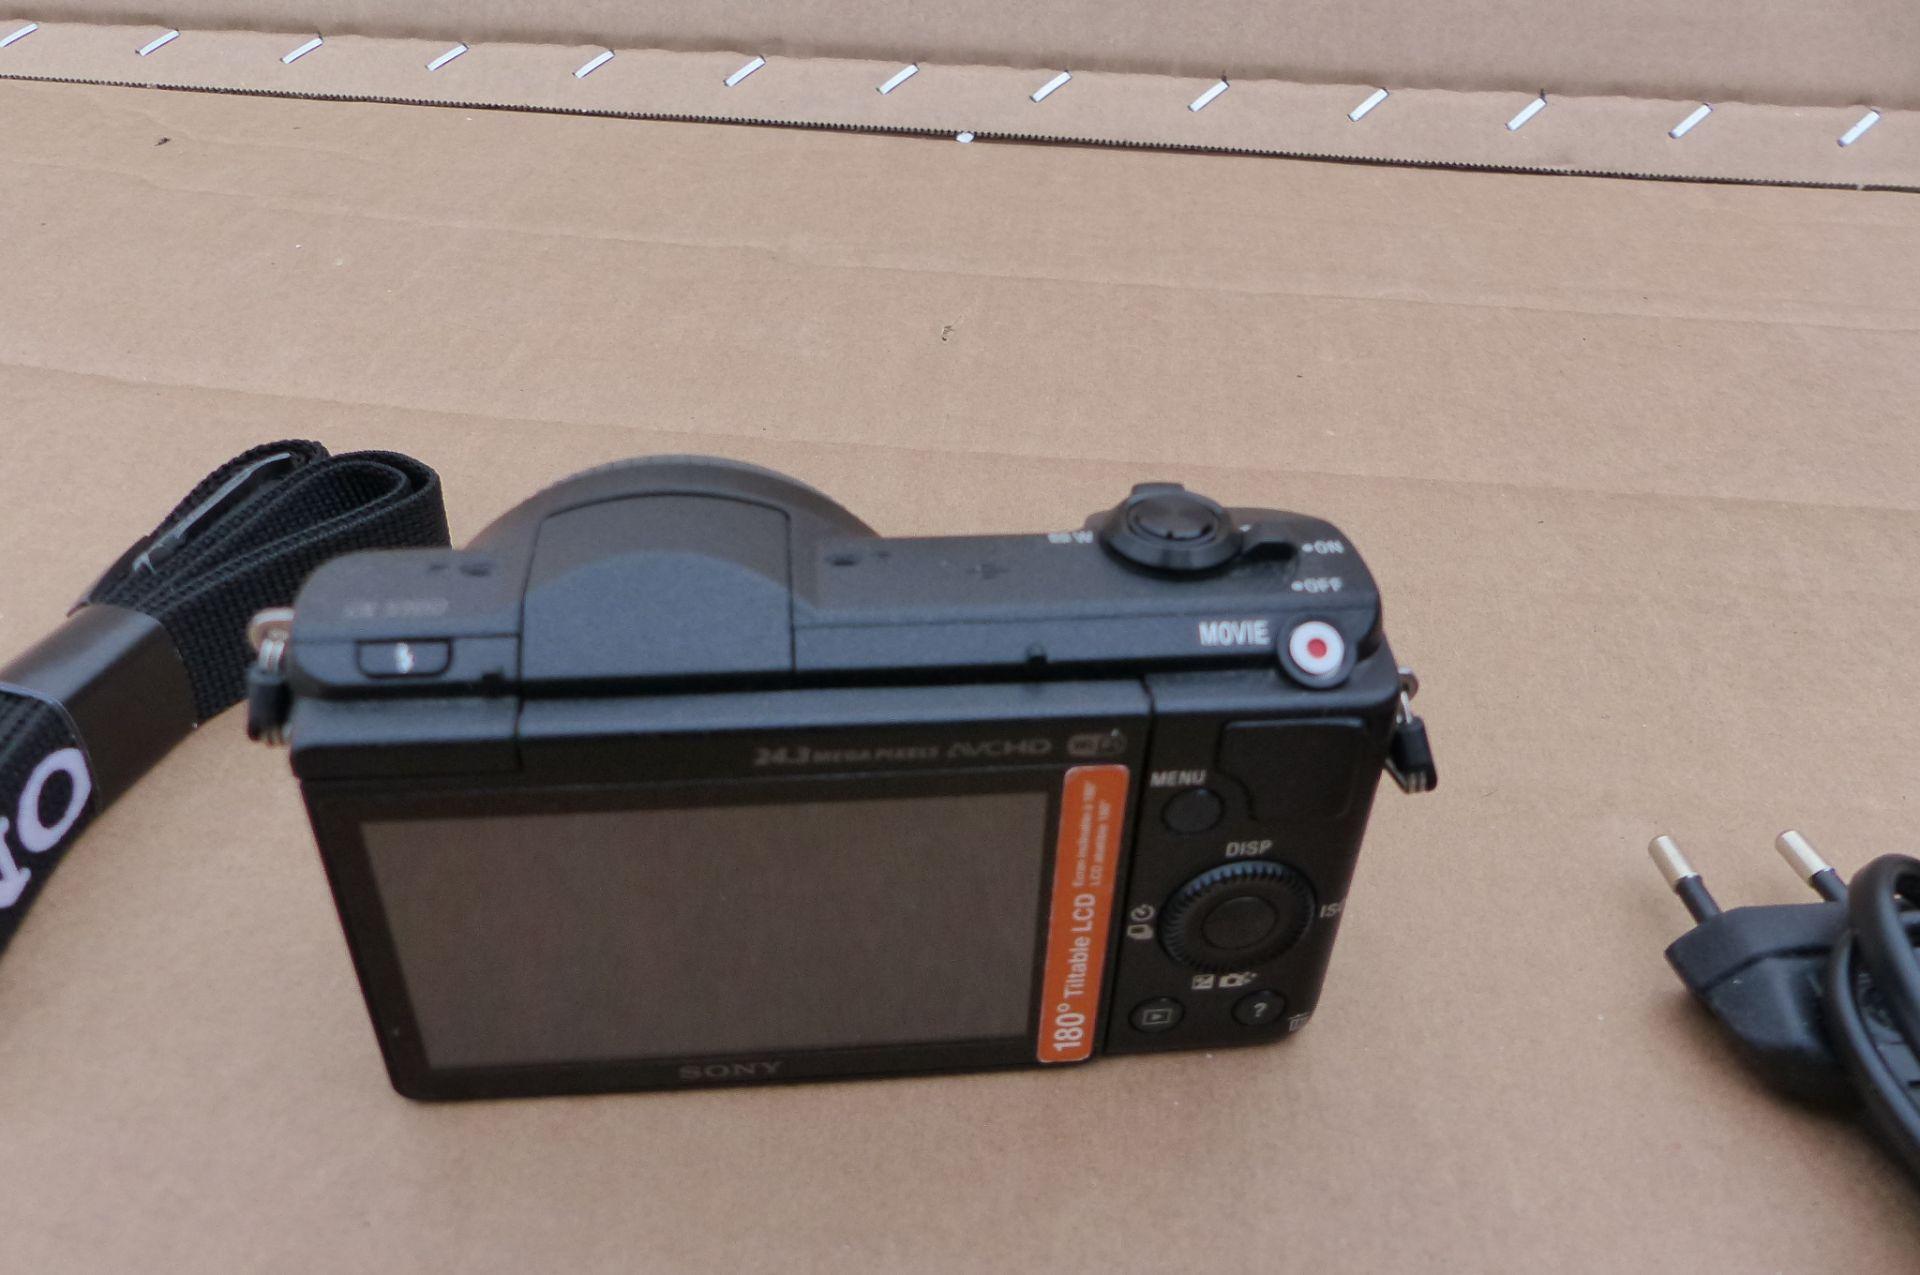 Sony 5100 camera - Image 3 of 3